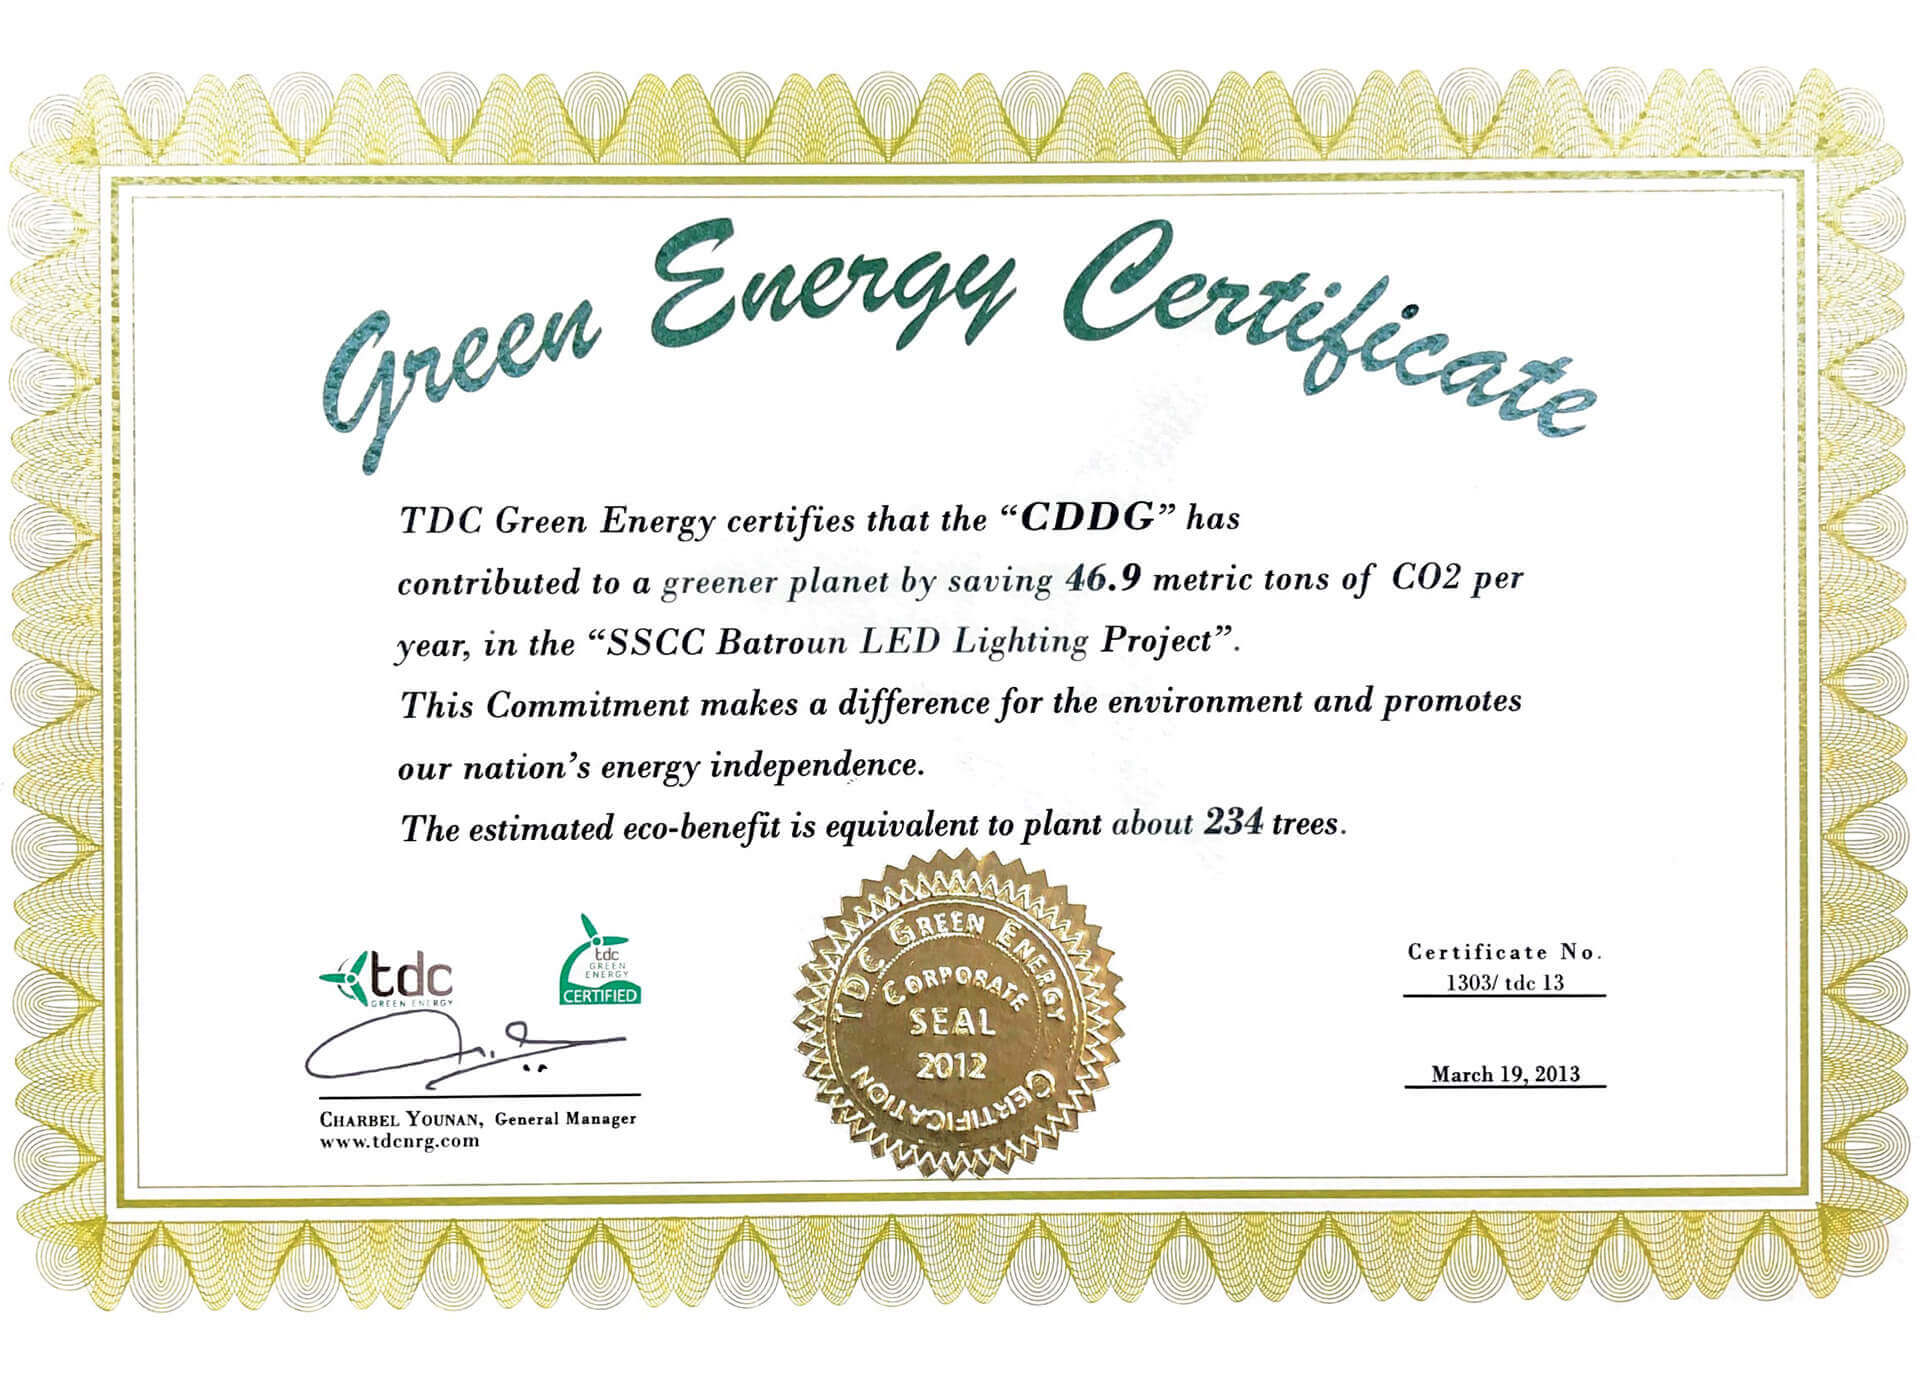 CDDG Green Energy Certificate